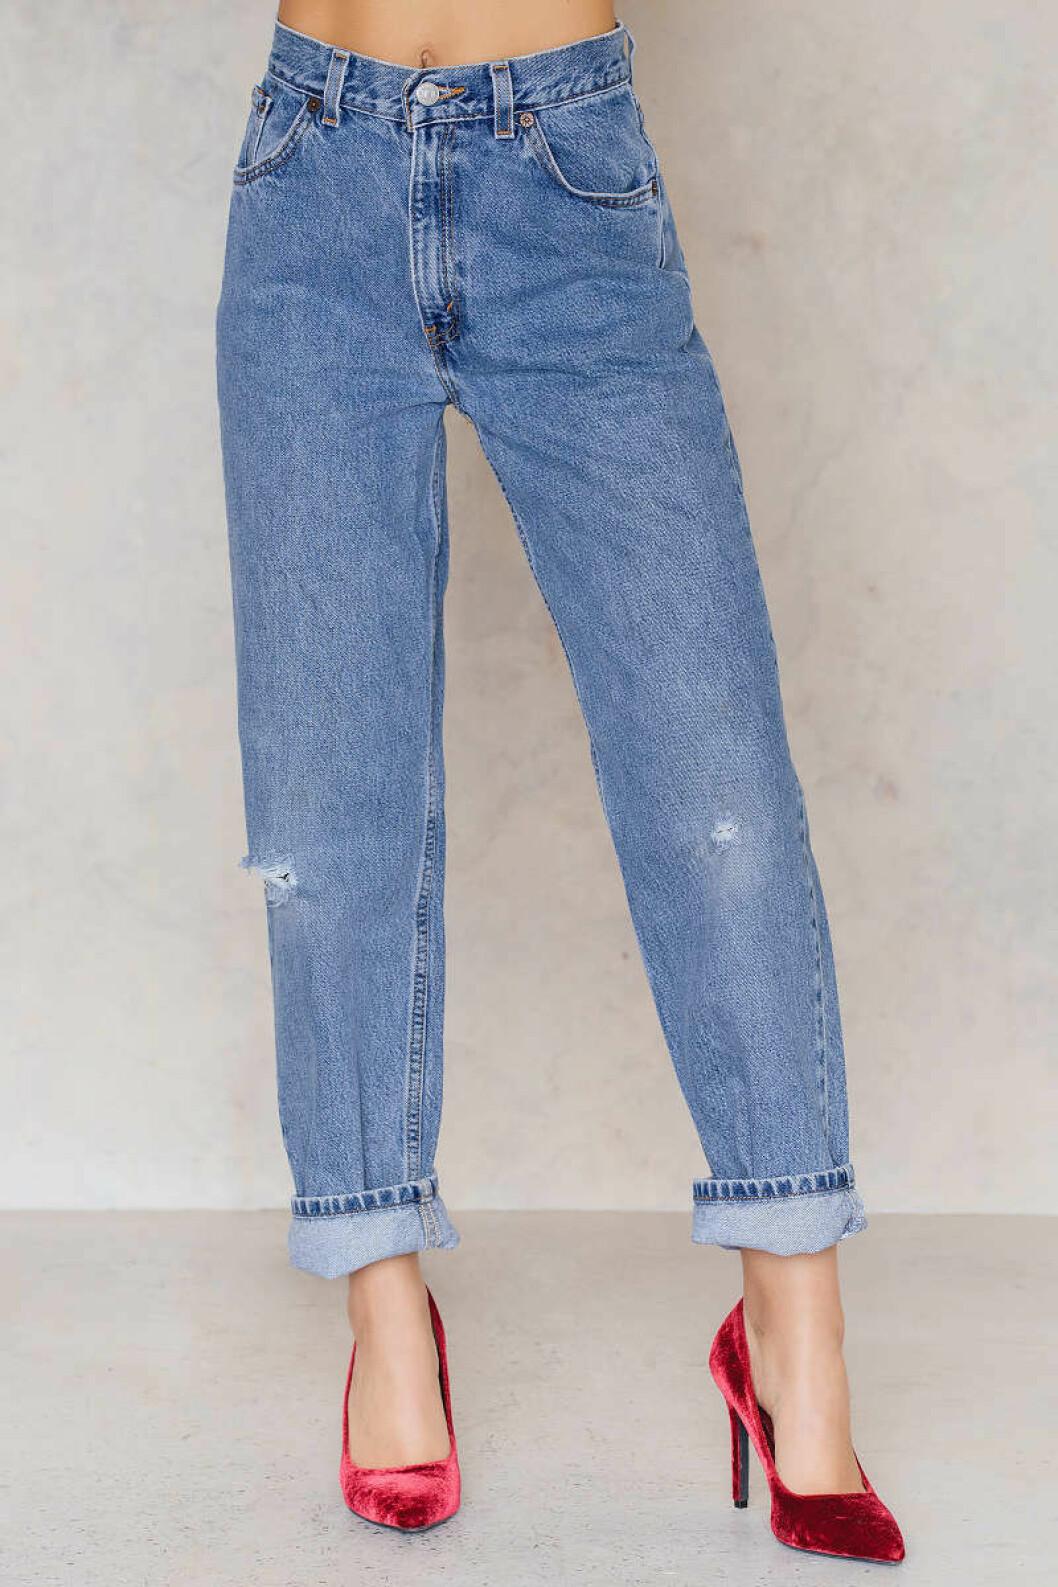 levis mom jeans vintage